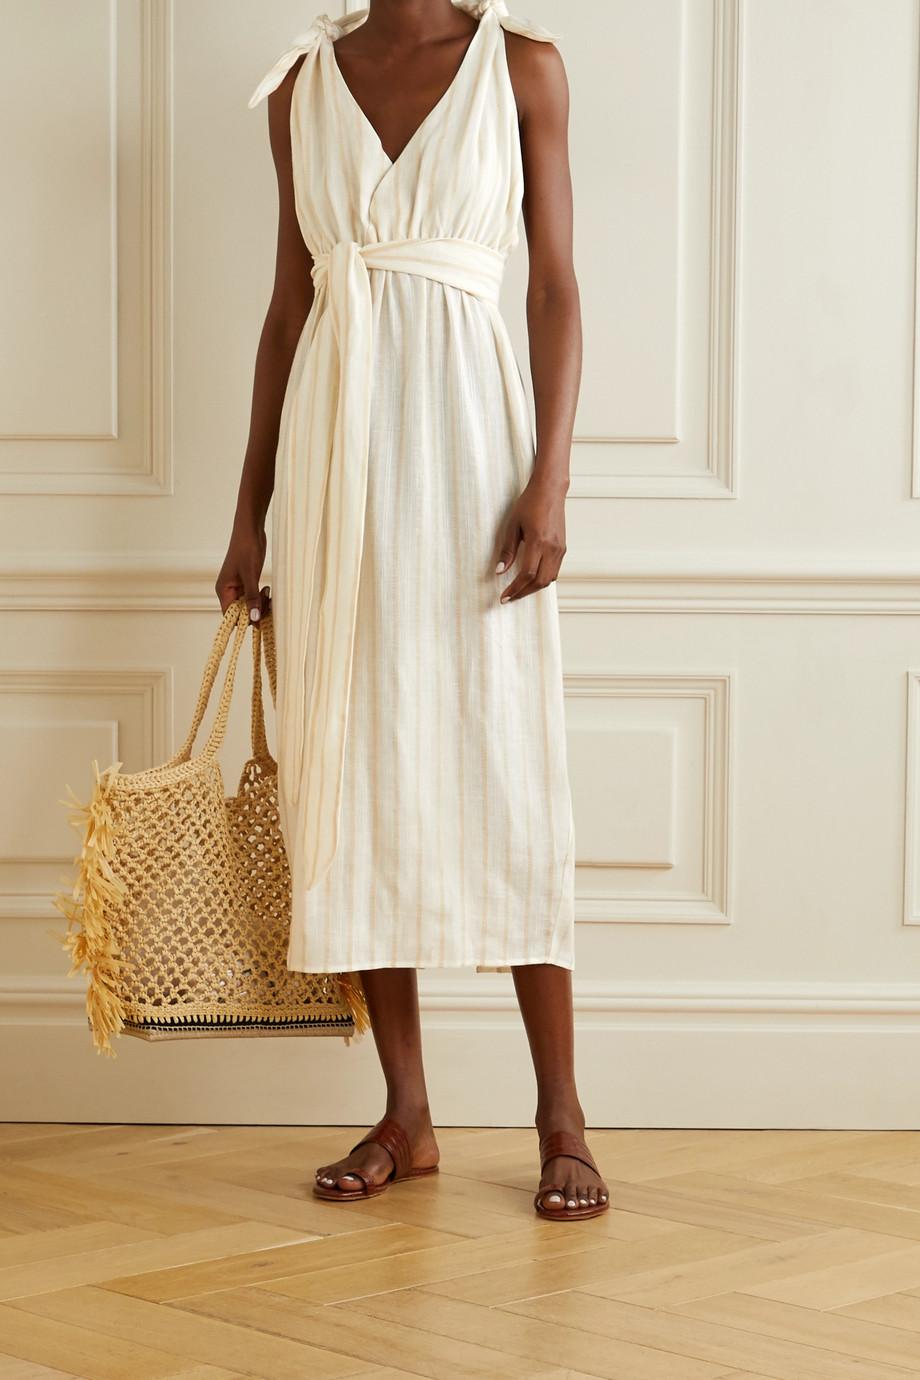 Mara Hoffman Calypso 配腰带条纹亚麻天丝莱赛尔纤维混纺中长连衣裙